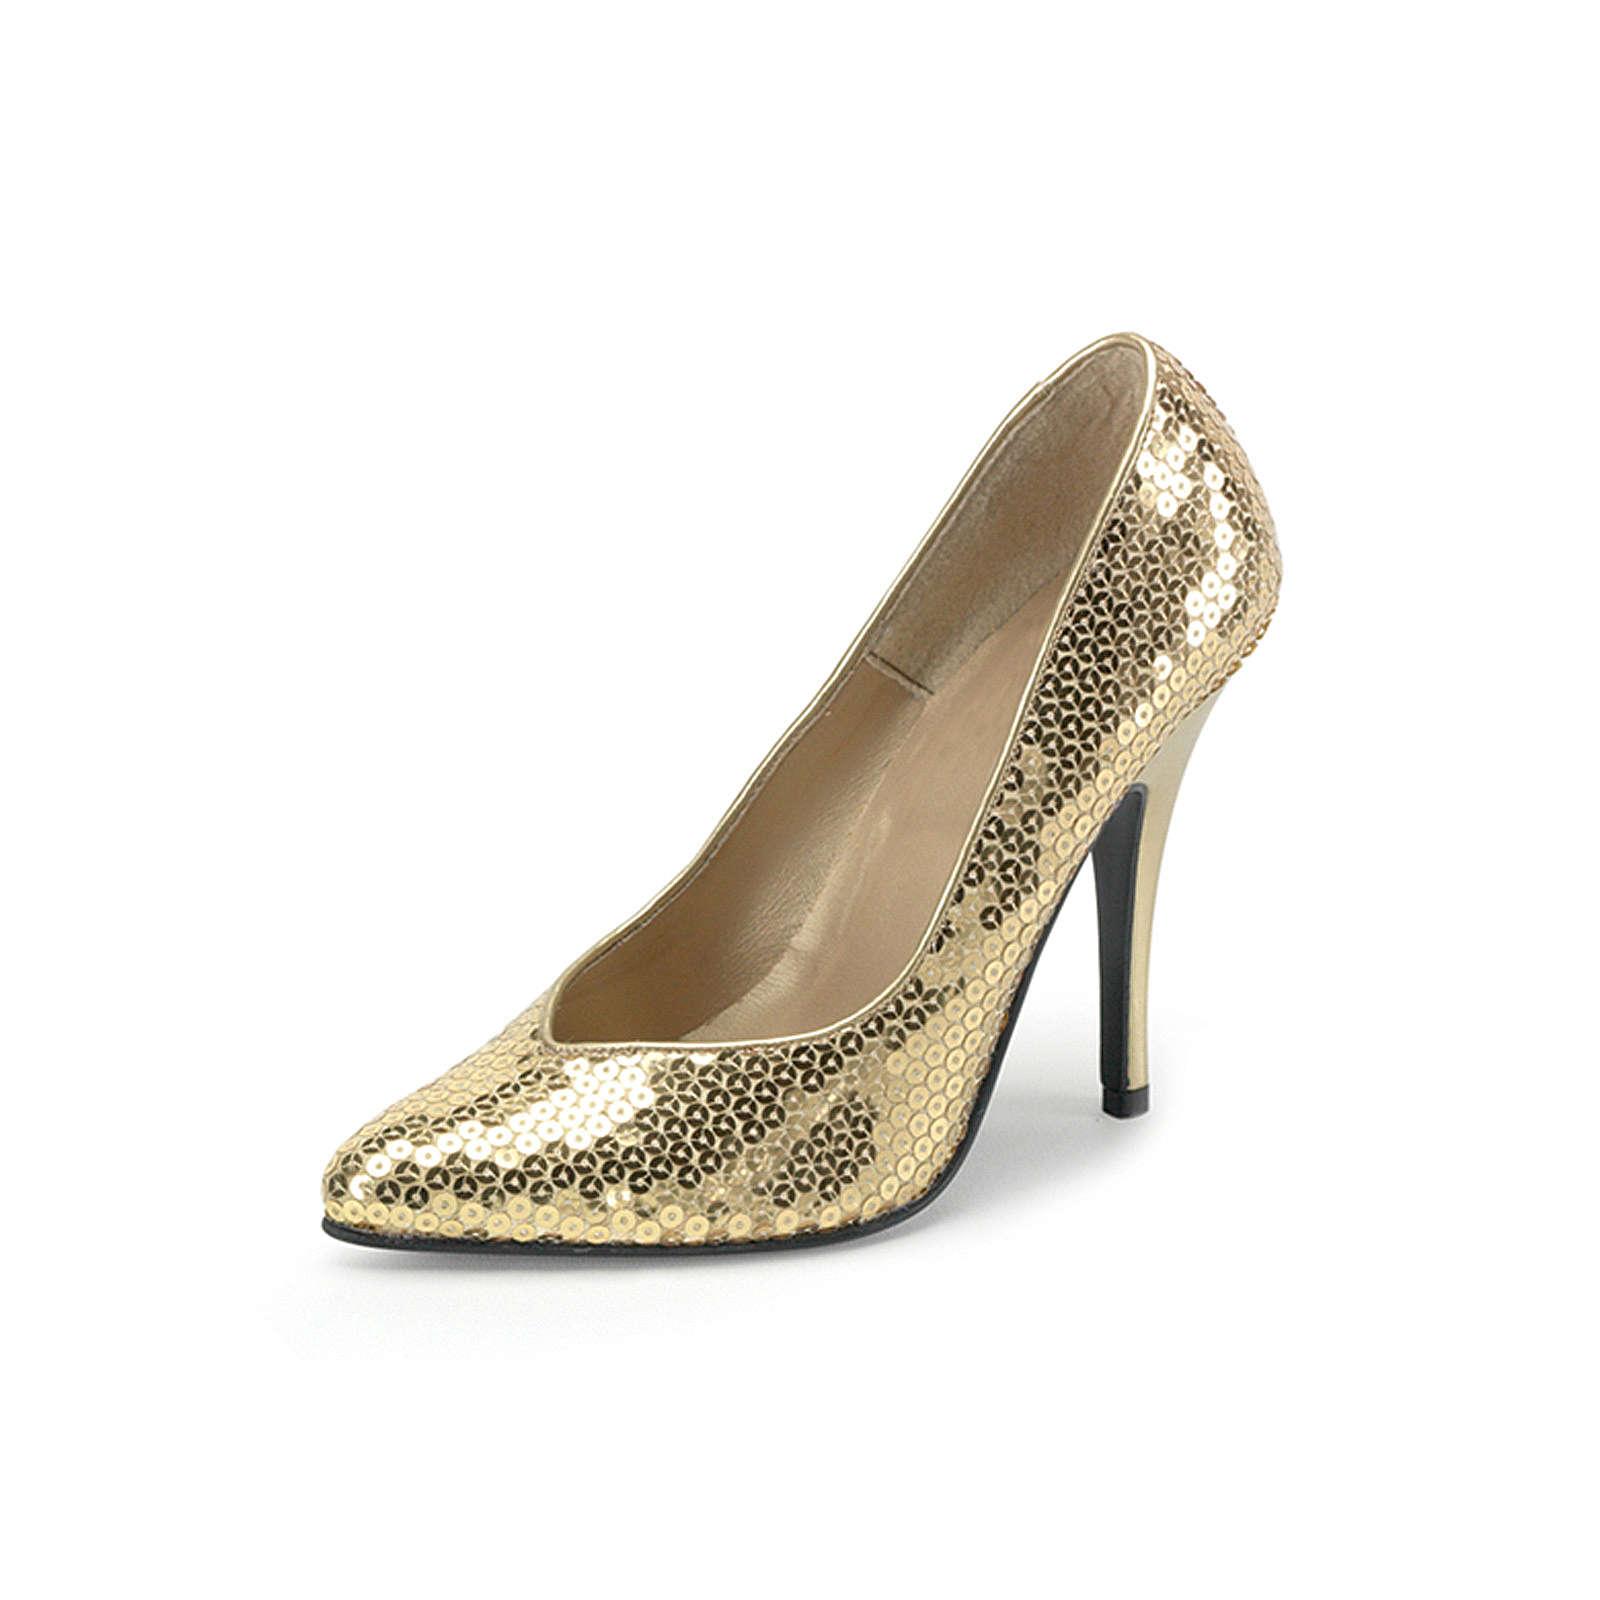 FUNTASMA® Kostümschuhe Seduce Klassische Pumps gold Damen Gr. 41,5